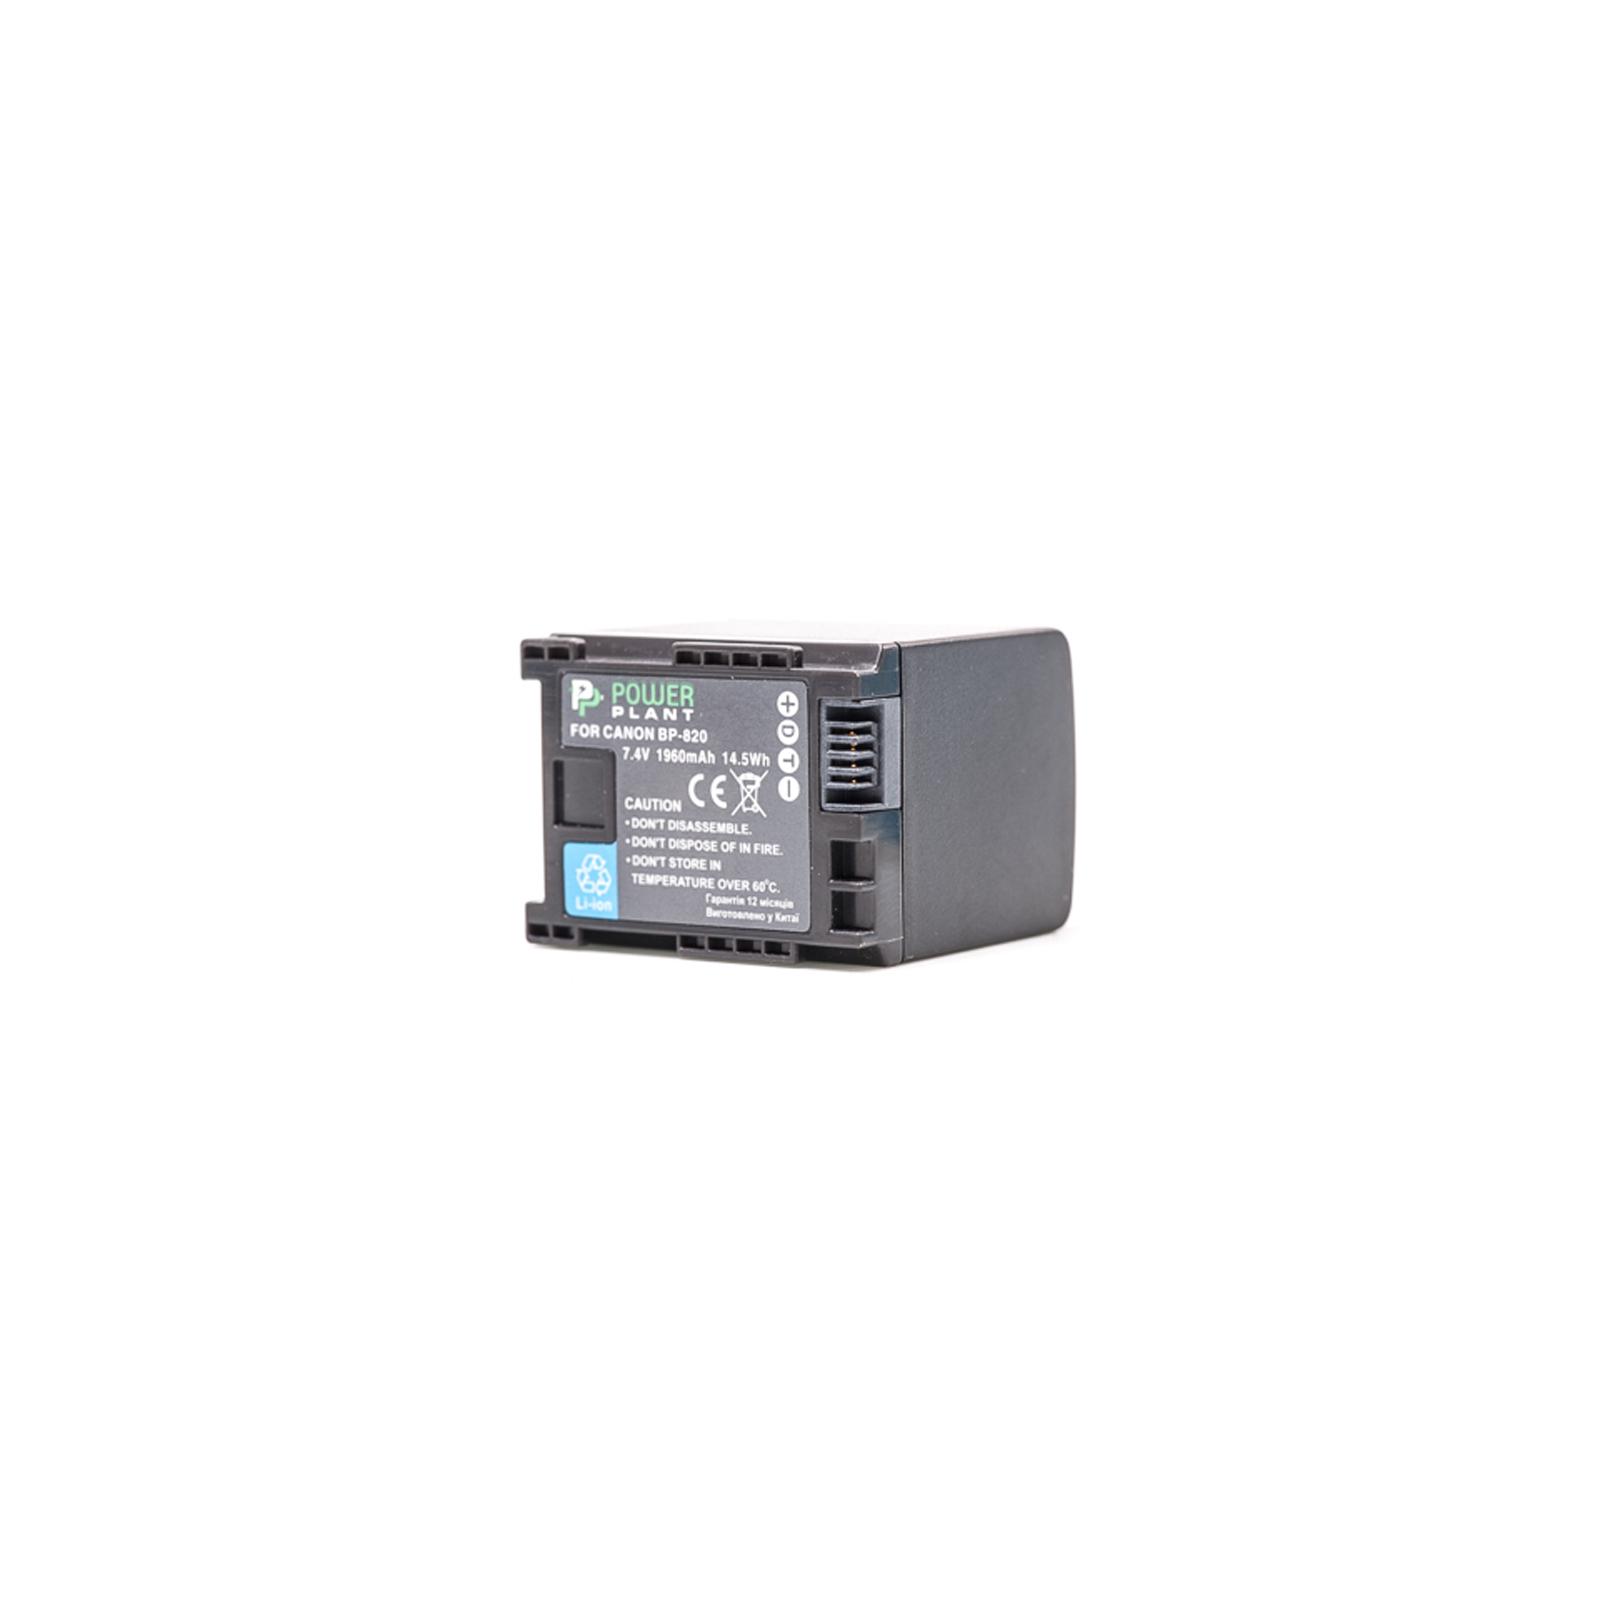 Аккумулятор к фото/видео PowerPlant Canon BP-820 Chip (DV00DV1371) изображение 2